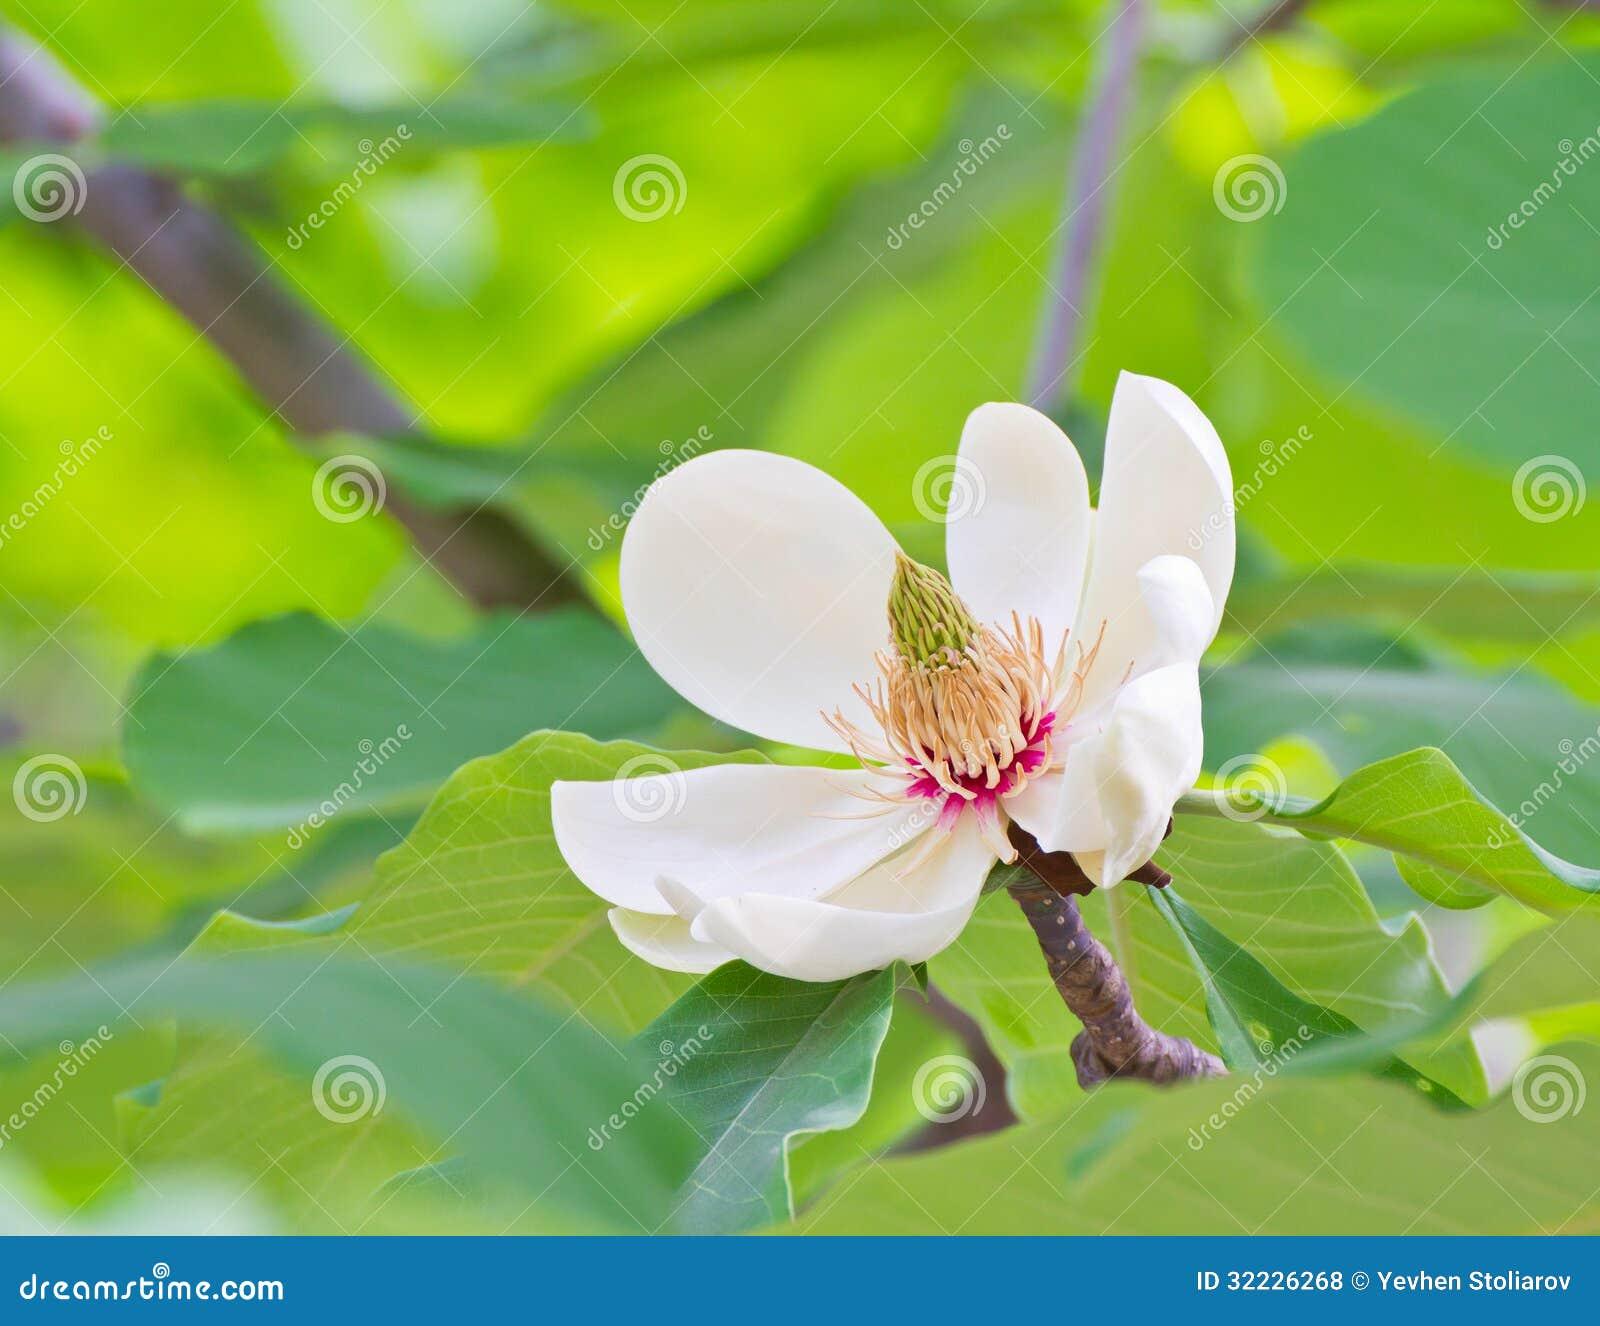 Download Magnólia na flor foto de stock. Imagem de flor, pétalas - 32226268